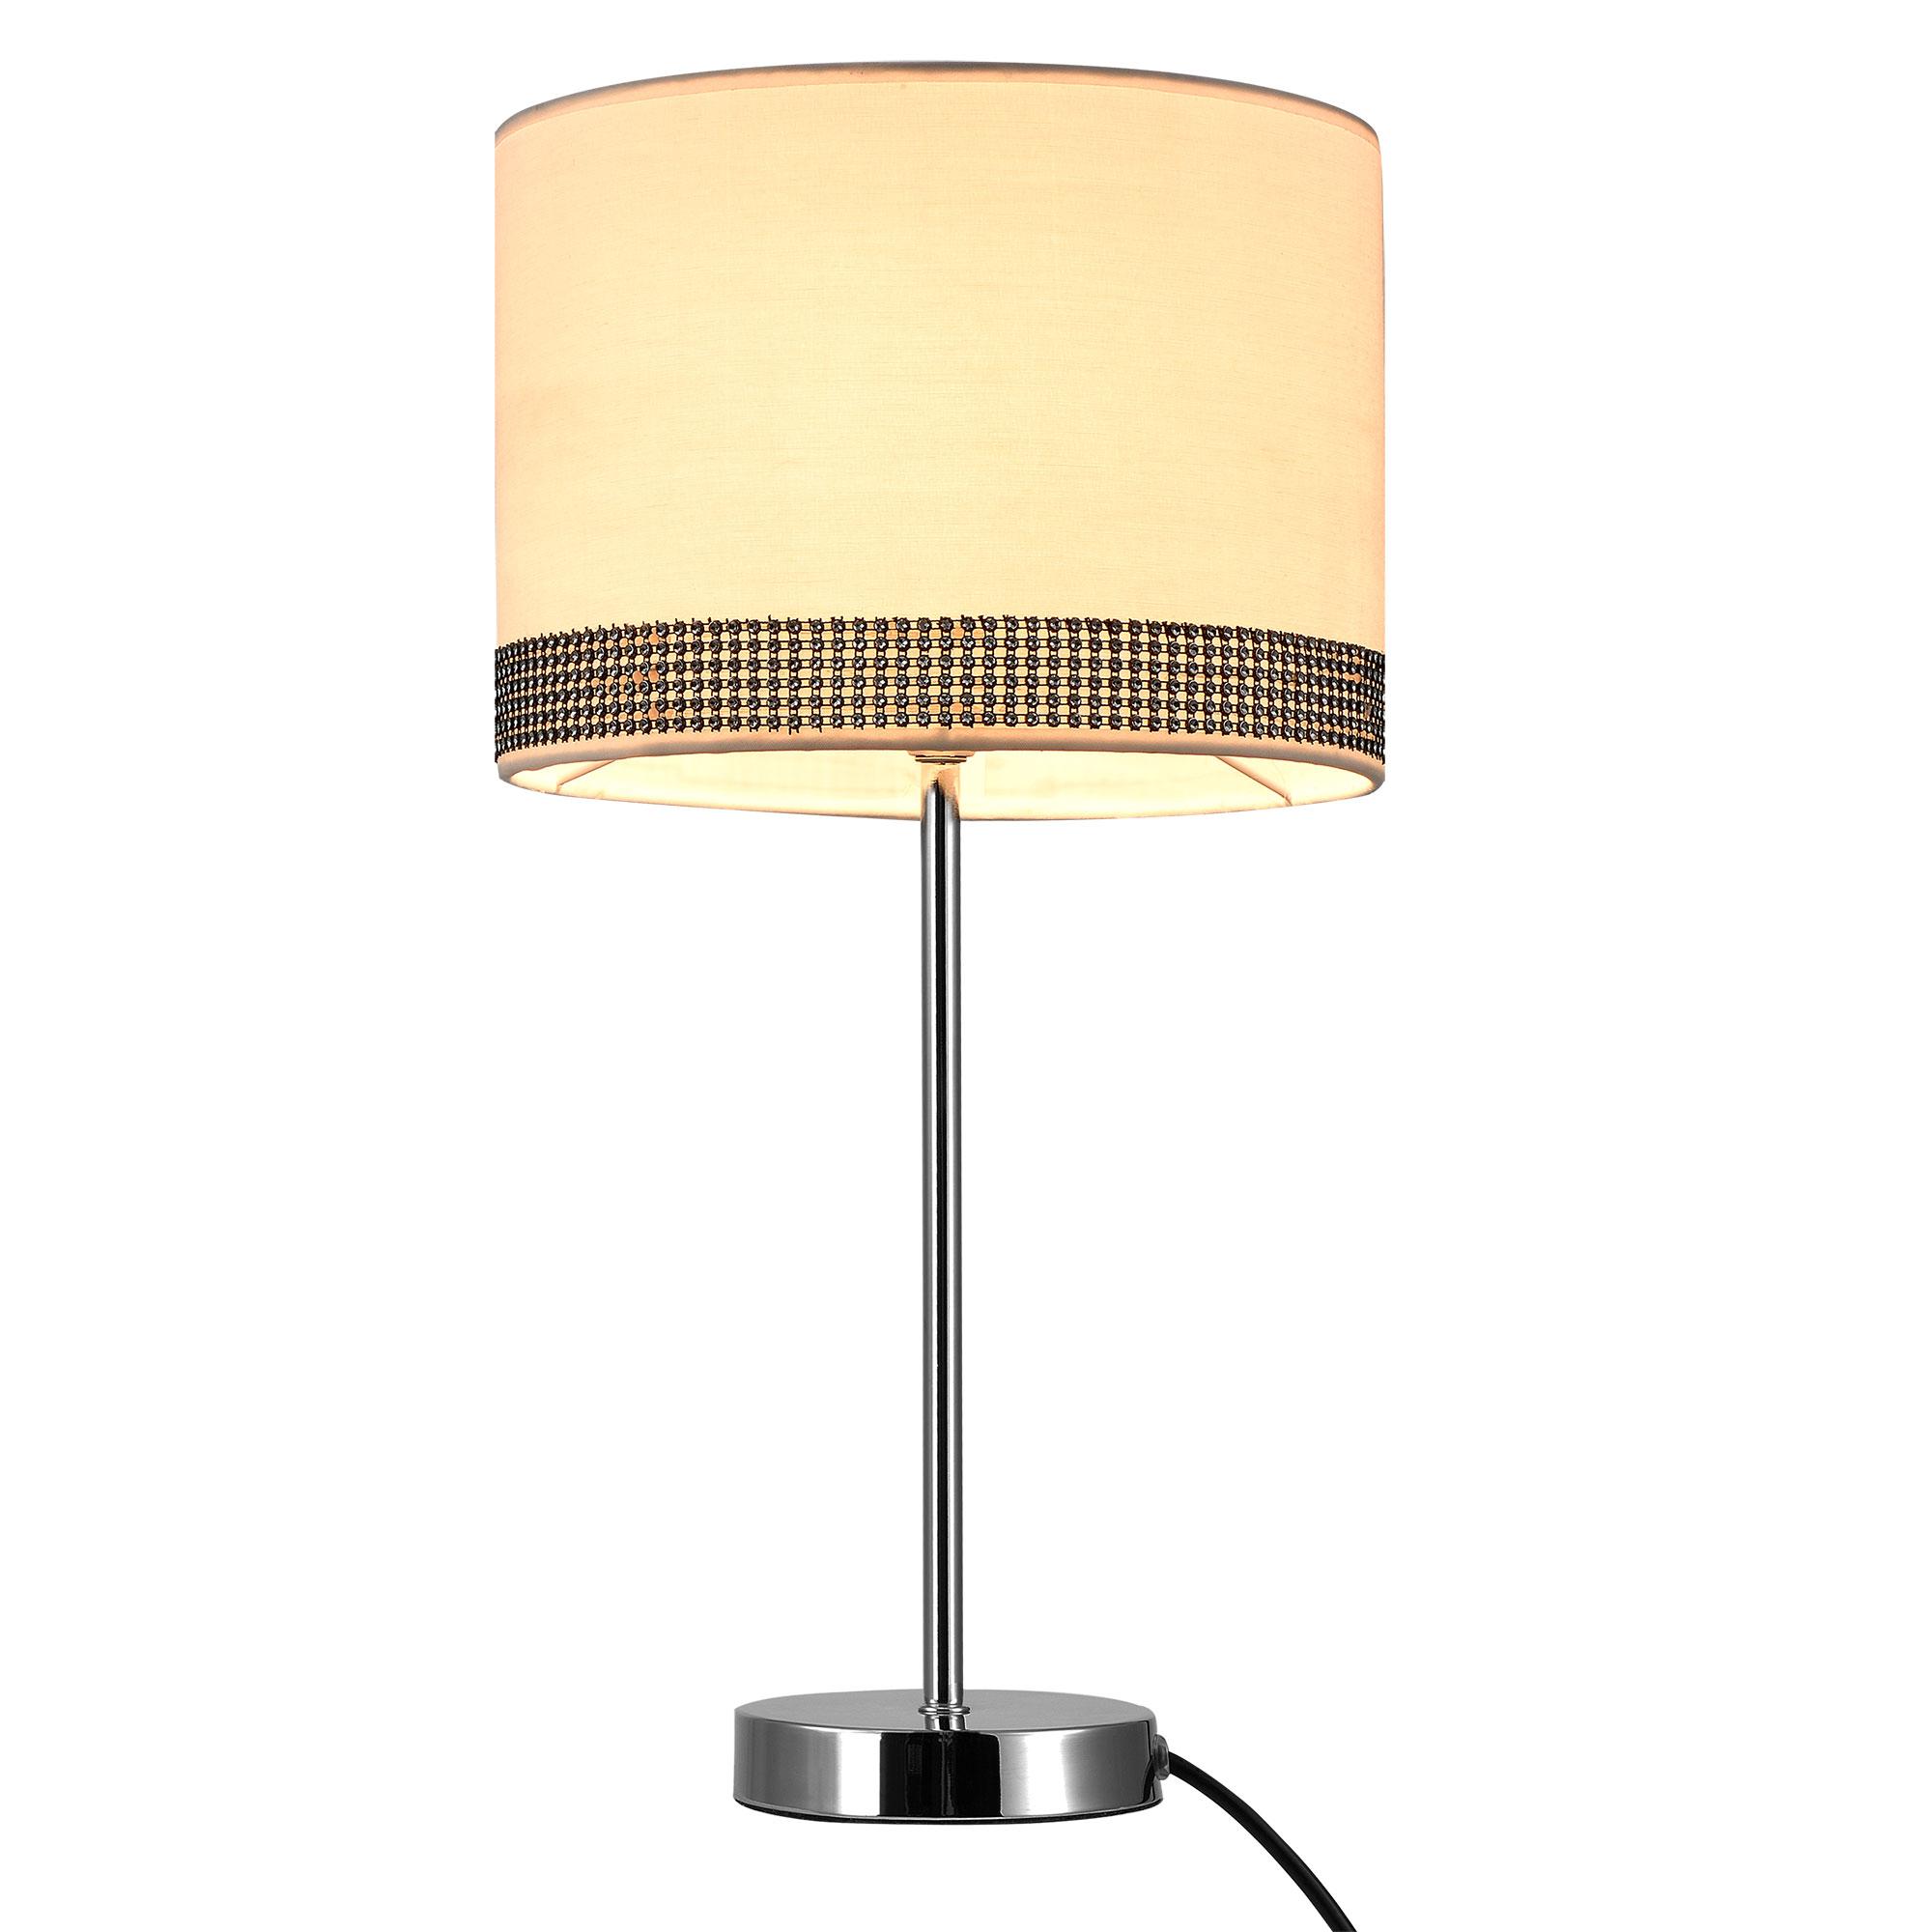 lampe de chevet table lecture clairage lumi re. Black Bedroom Furniture Sets. Home Design Ideas